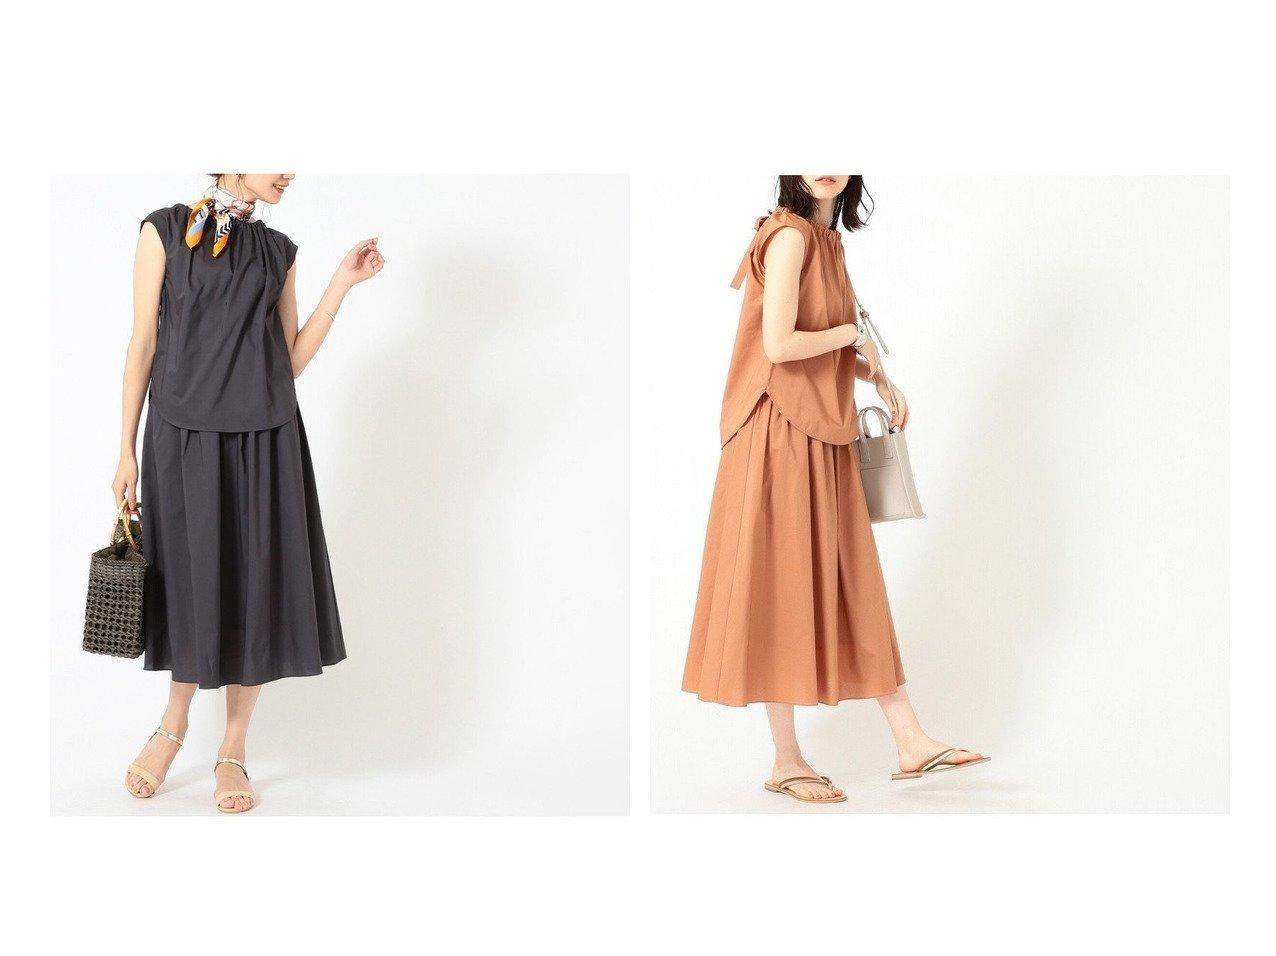 【B:MING by BEAMS/ビーミング by ビームス】のエアリーコットン セットアップ 21SS 【ワンピース・ドレス】おすすめ!人気、トレンド・レディースファッションの通販 おすすめで人気の流行・トレンド、ファッションの通販商品 メンズファッション・キッズファッション・インテリア・家具・レディースファッション・服の通販 founy(ファニー) https://founy.com/ ファッション Fashion レディースファッション WOMEN ワンピース Dress 2021年 2021 2021春夏・S/S SS/Spring/Summer/2021 S/S・春夏 SS・Spring/Summer エアリー ギャザー セットアップ ノースリーブ リラックス 再入荷 Restock/Back in Stock/Re Arrival  ID:crp329100000035560